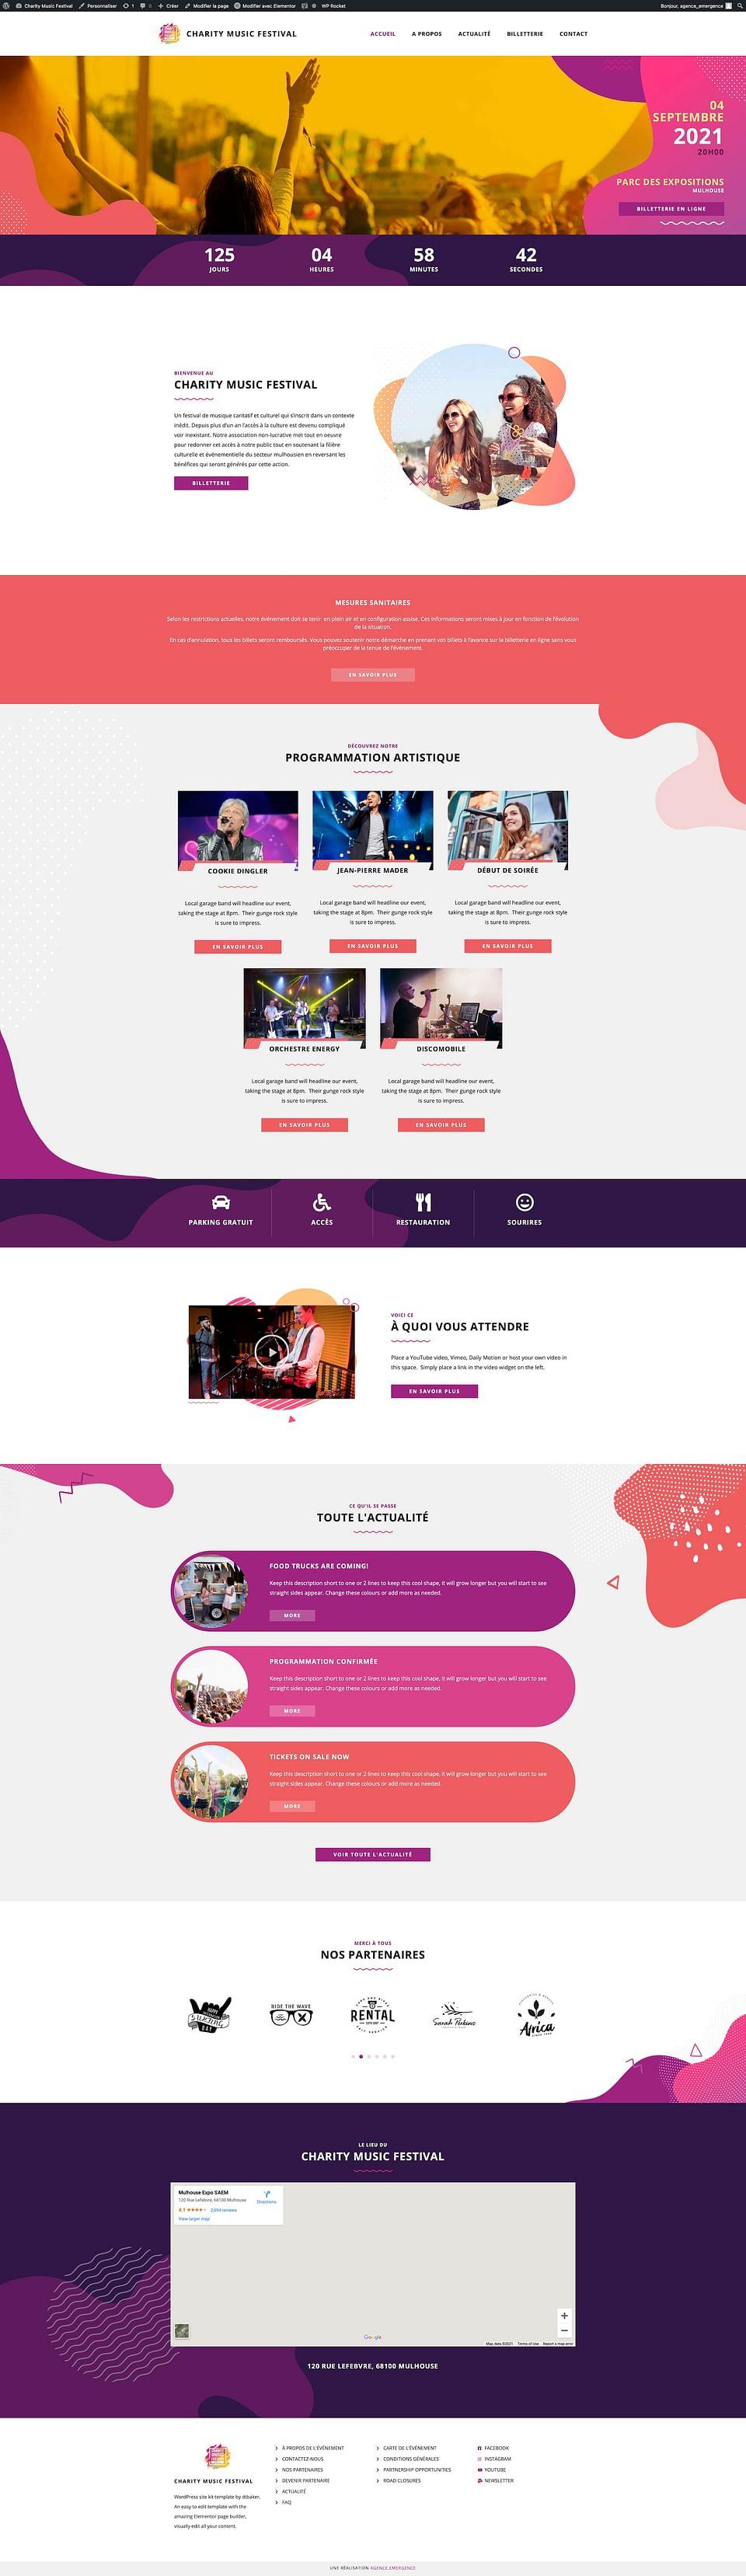 Site e-commerce Charity Music Festival